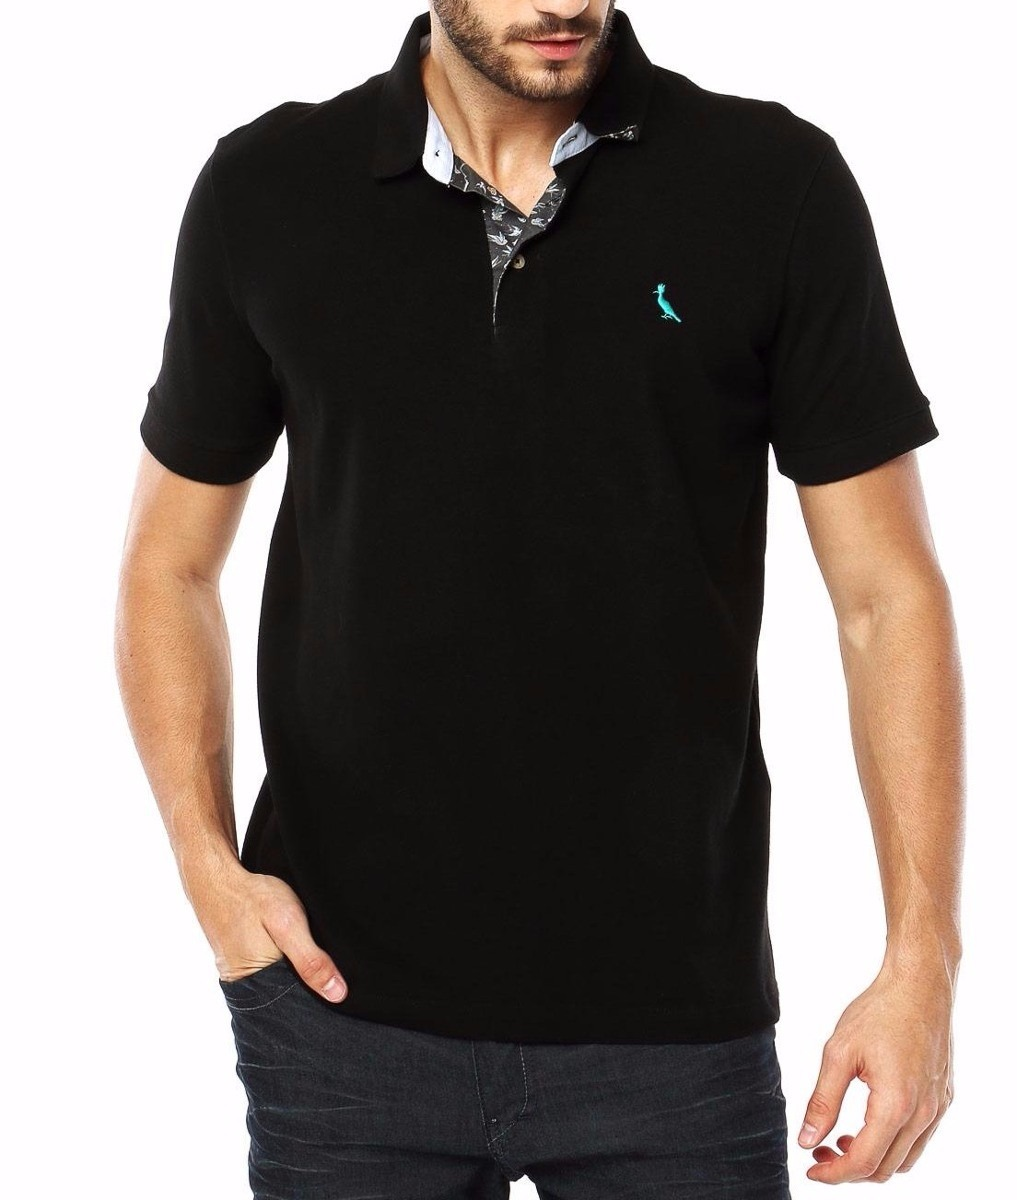 camisa reserva gola polo masculina. Carregando zoom. ecfb1287b74eb